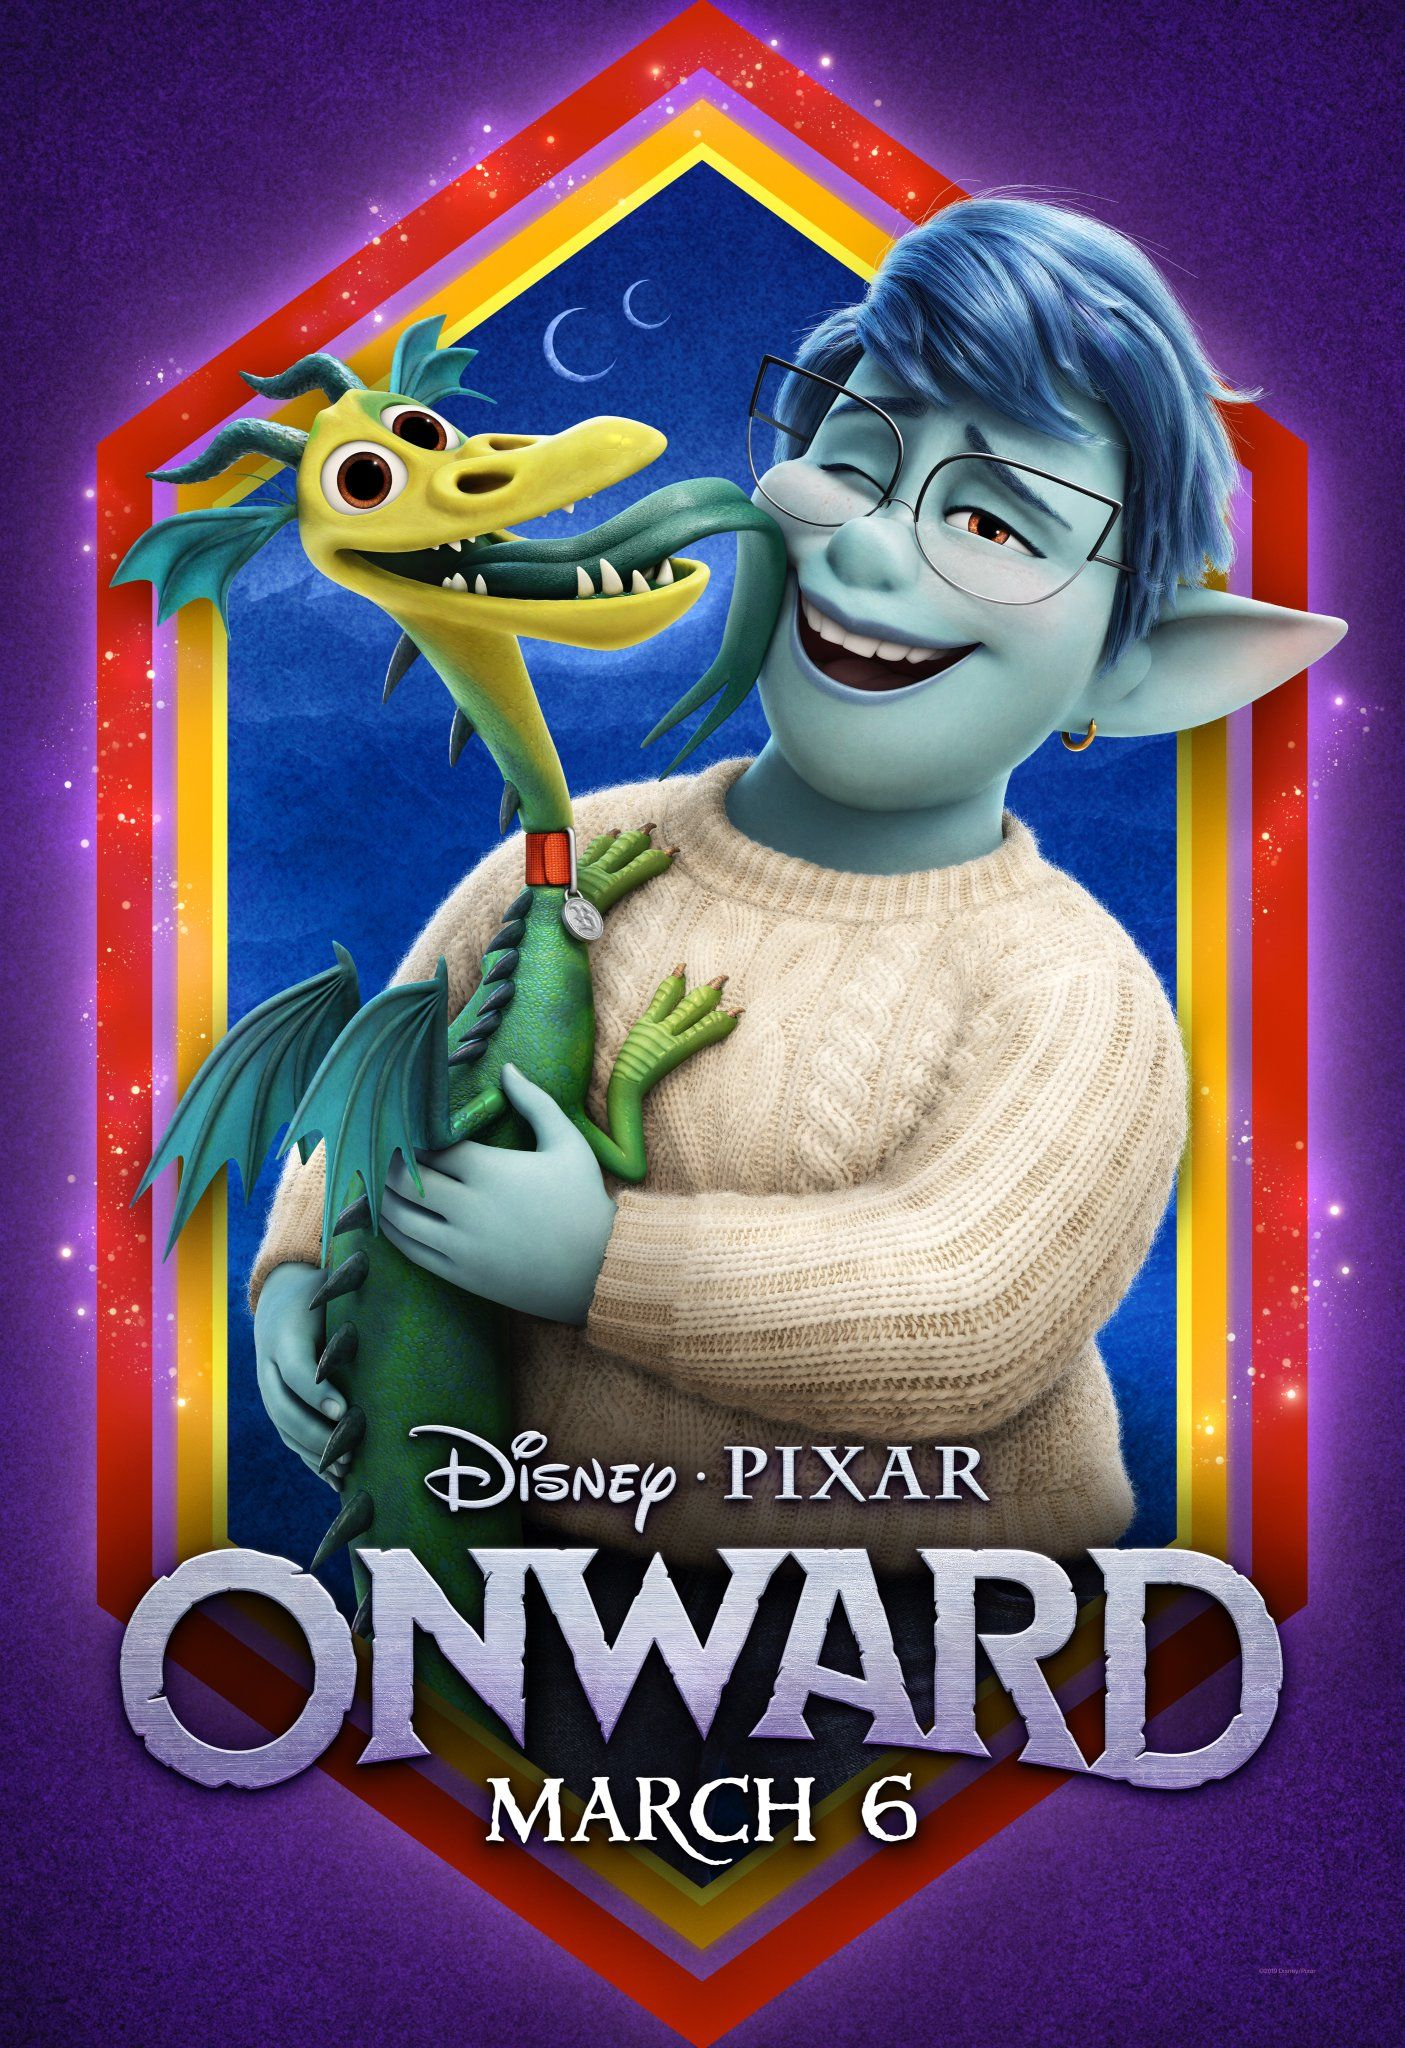 Walt Disney Studios On Twitter Disney Pixar Pixar Free Movies Online